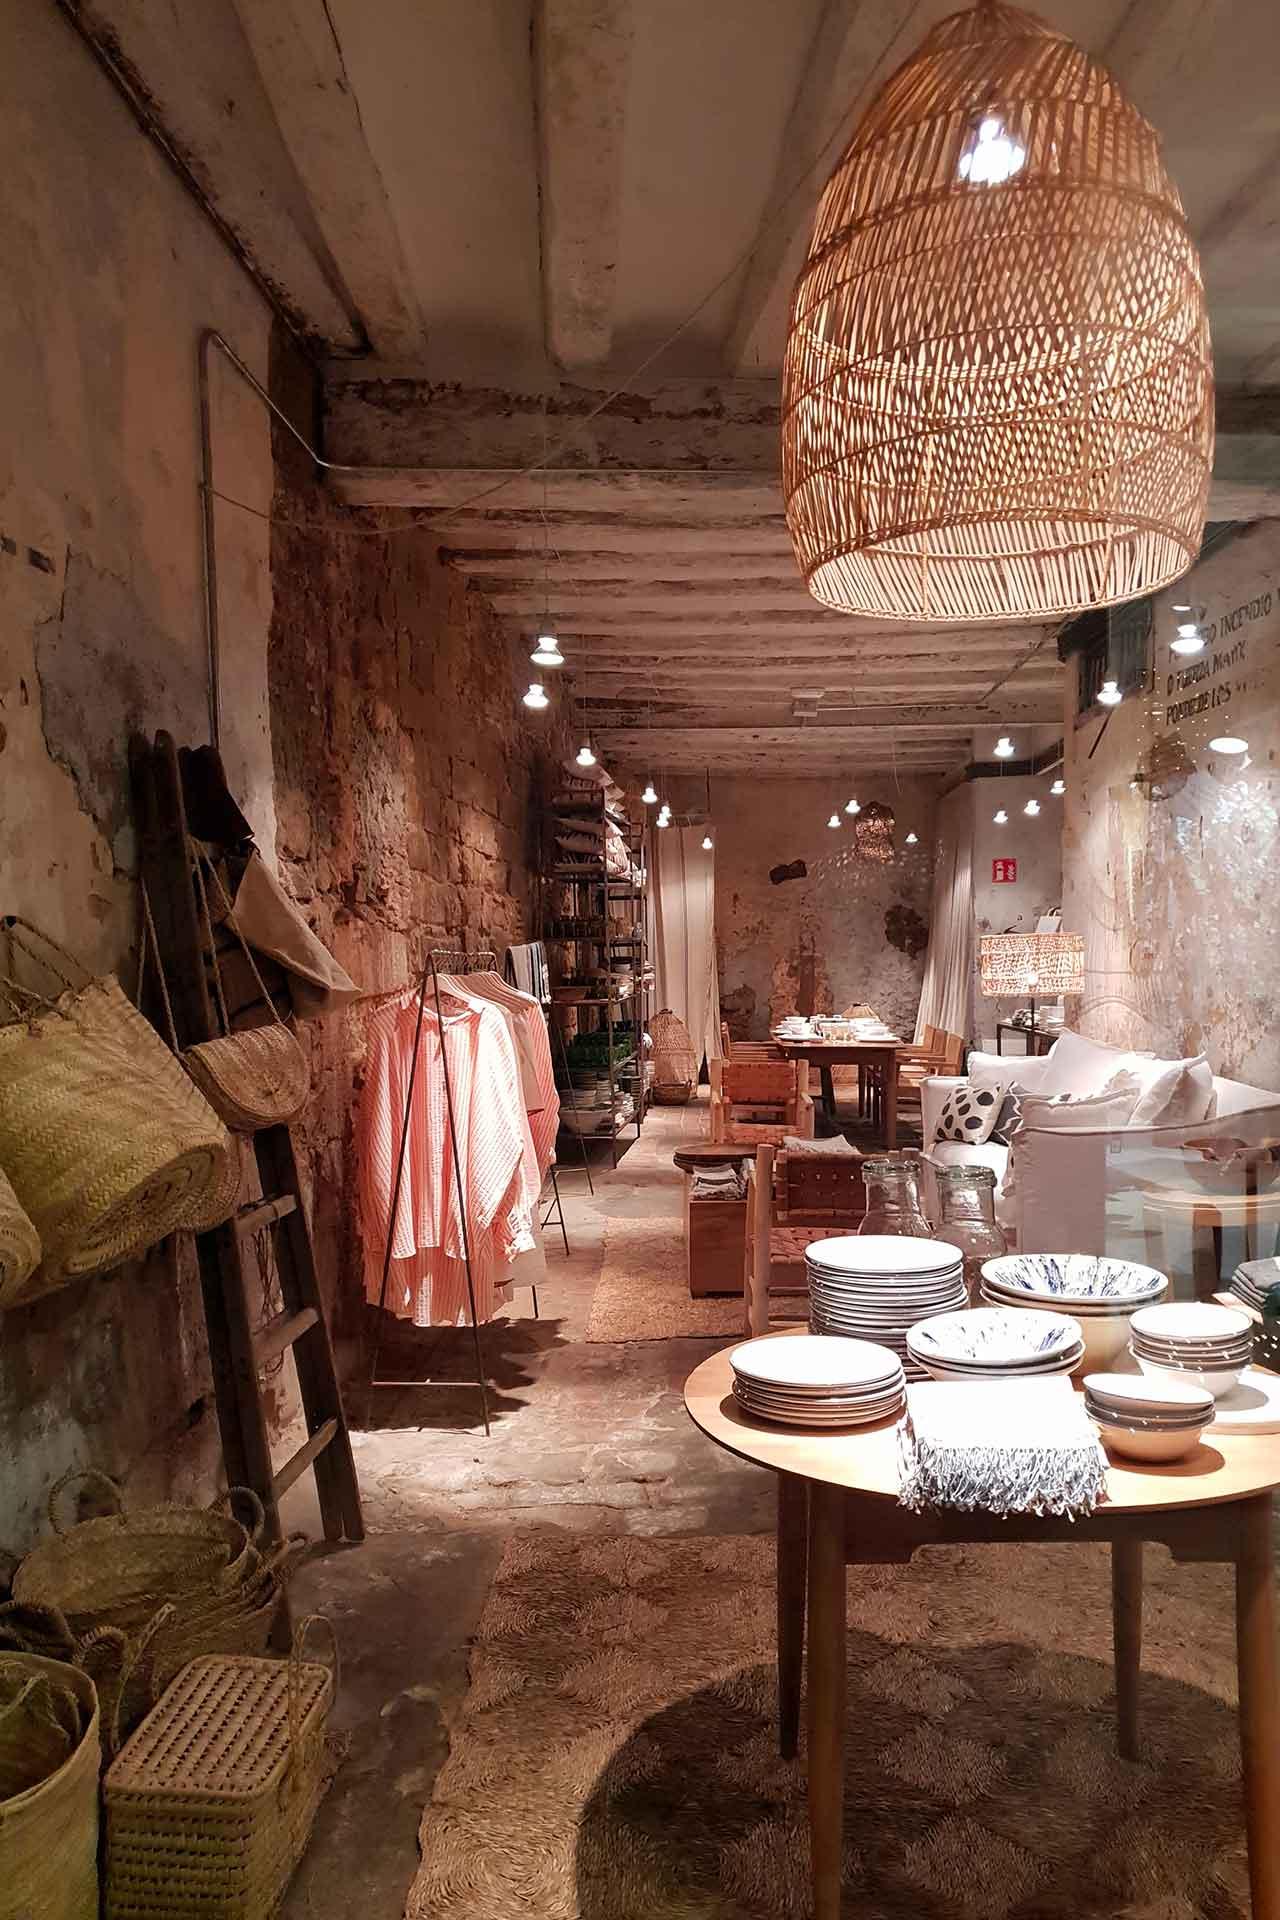 barcellona, el born negozio